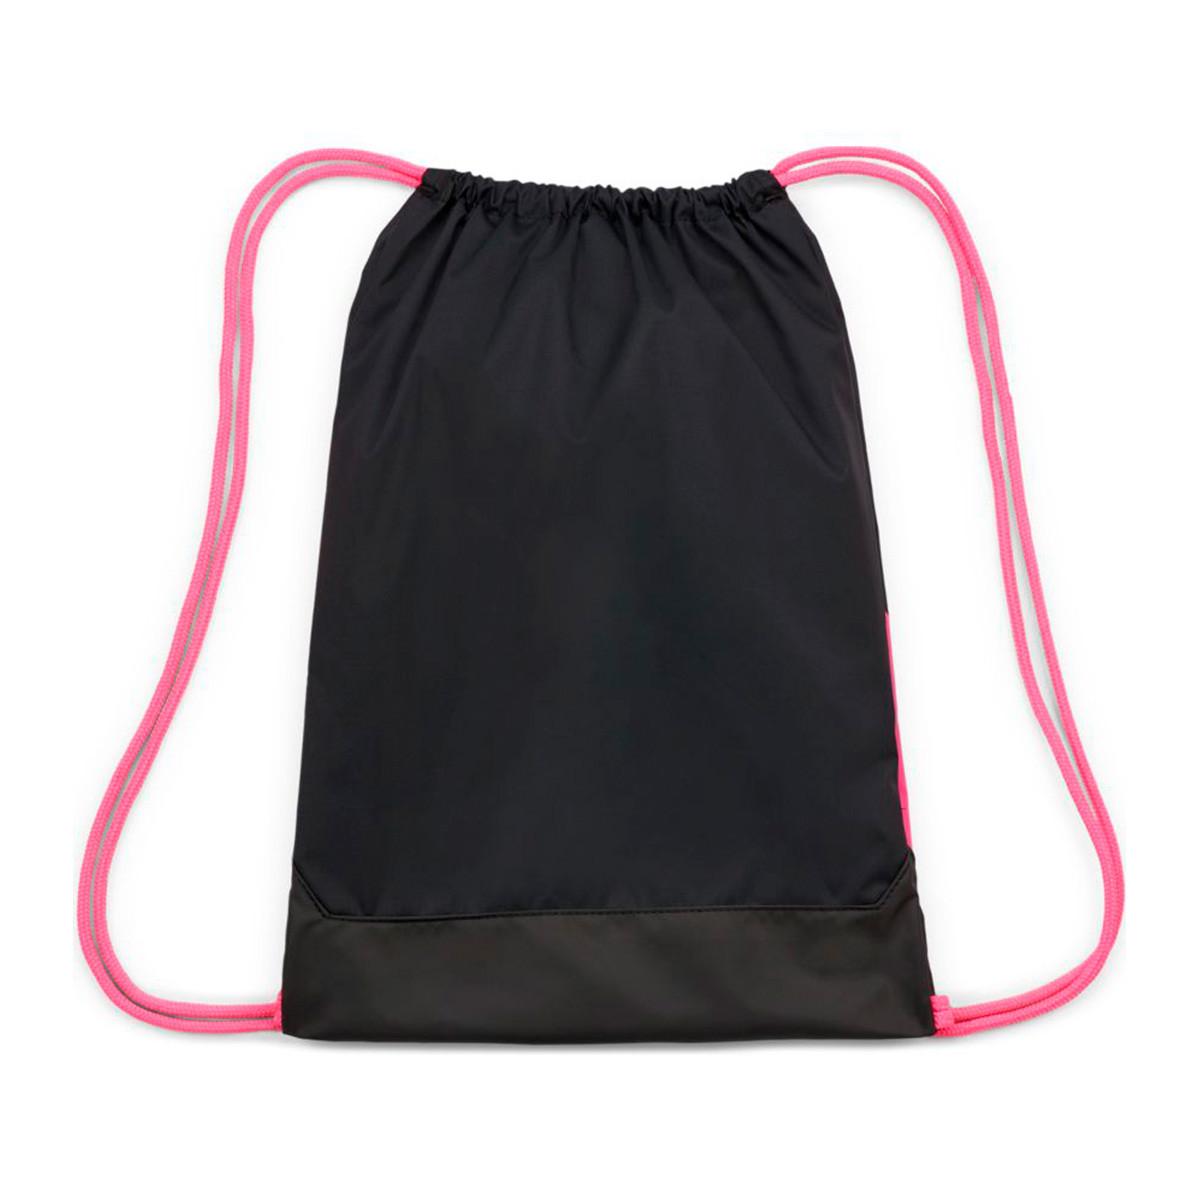 Escultor Recomendado Evaluación  Bag Nike Gym Sack Phantom Black-Pink blast-White - Football store Fútbol  Emotion